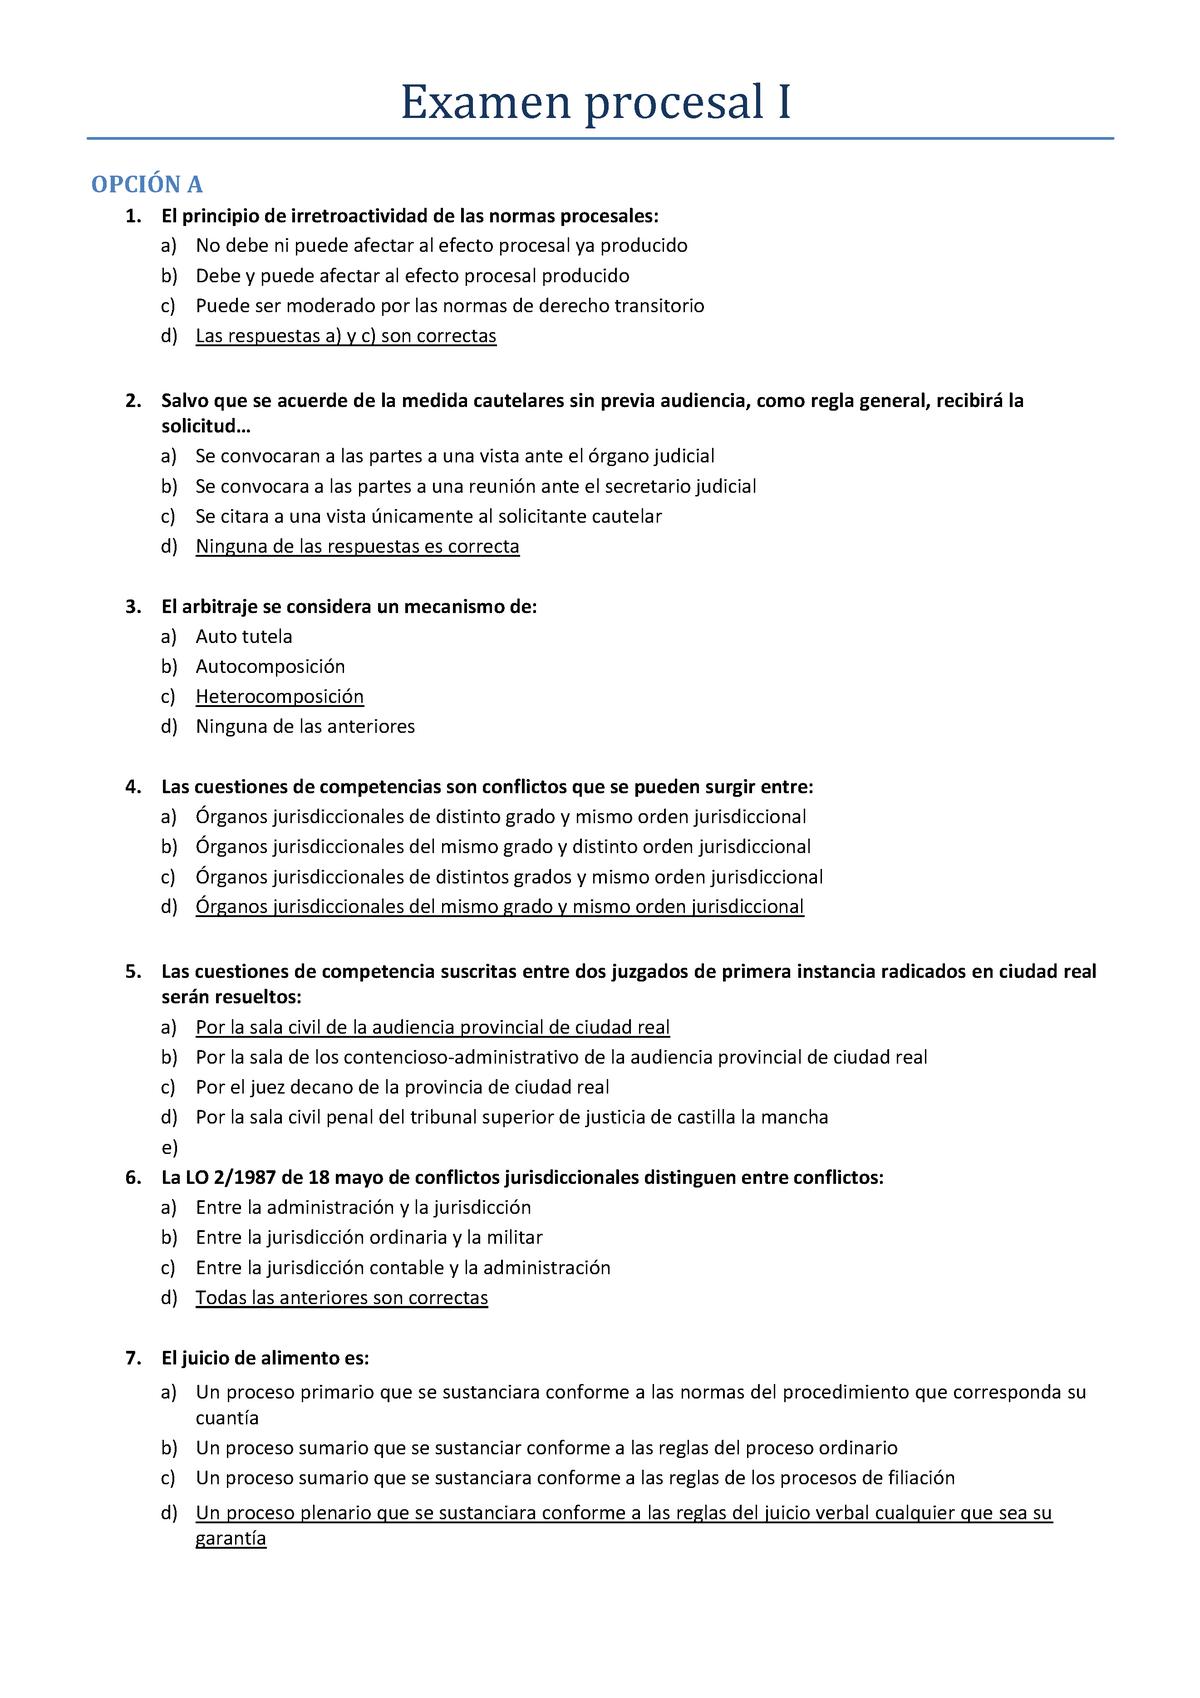 Examen 2017 Preguntas Studocu